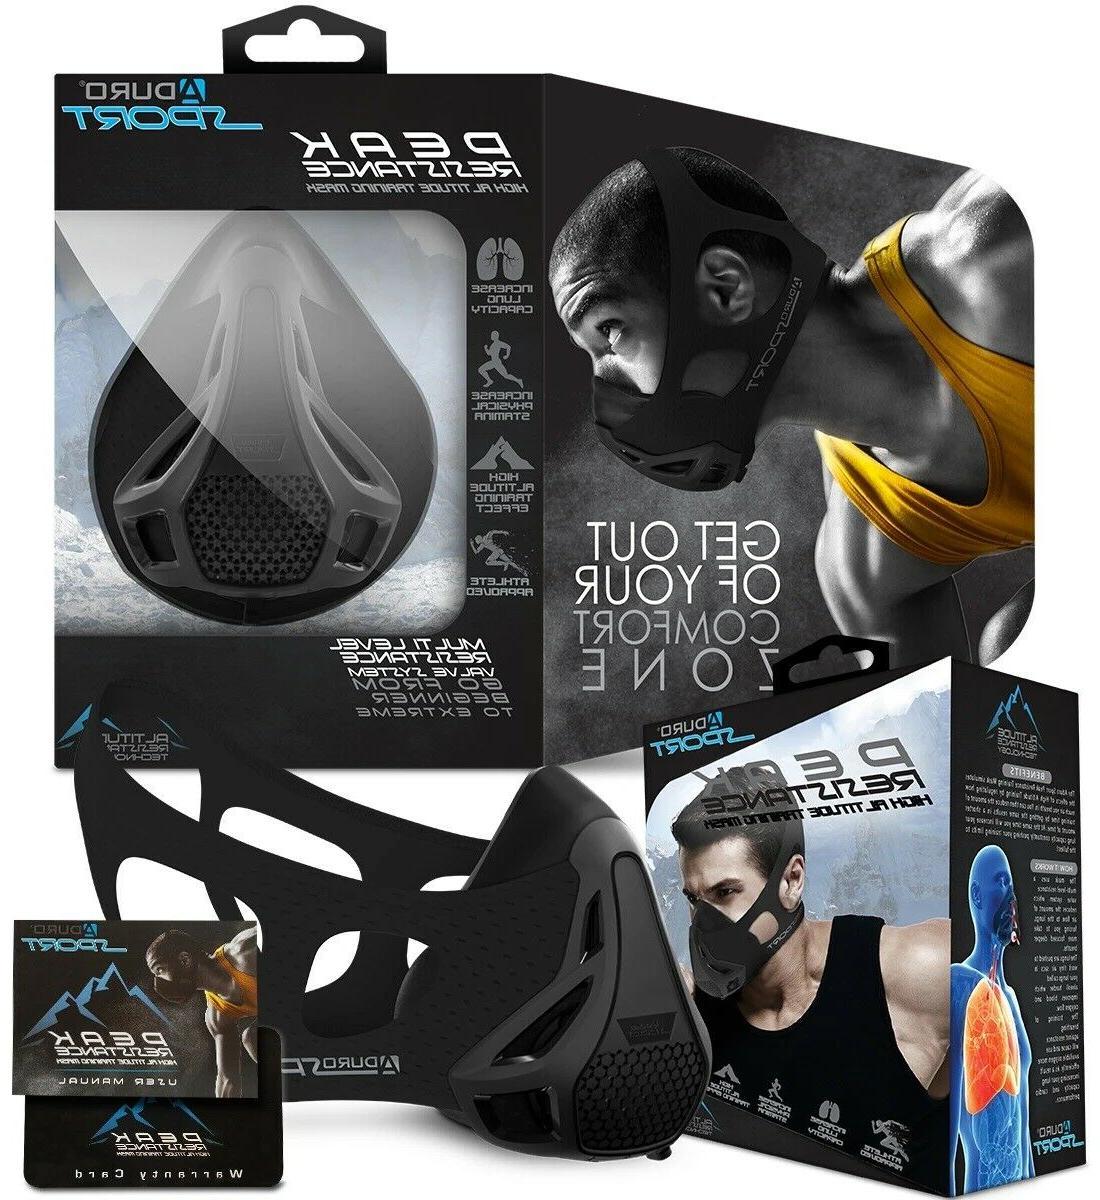 peak resistance workout training mask high altitude